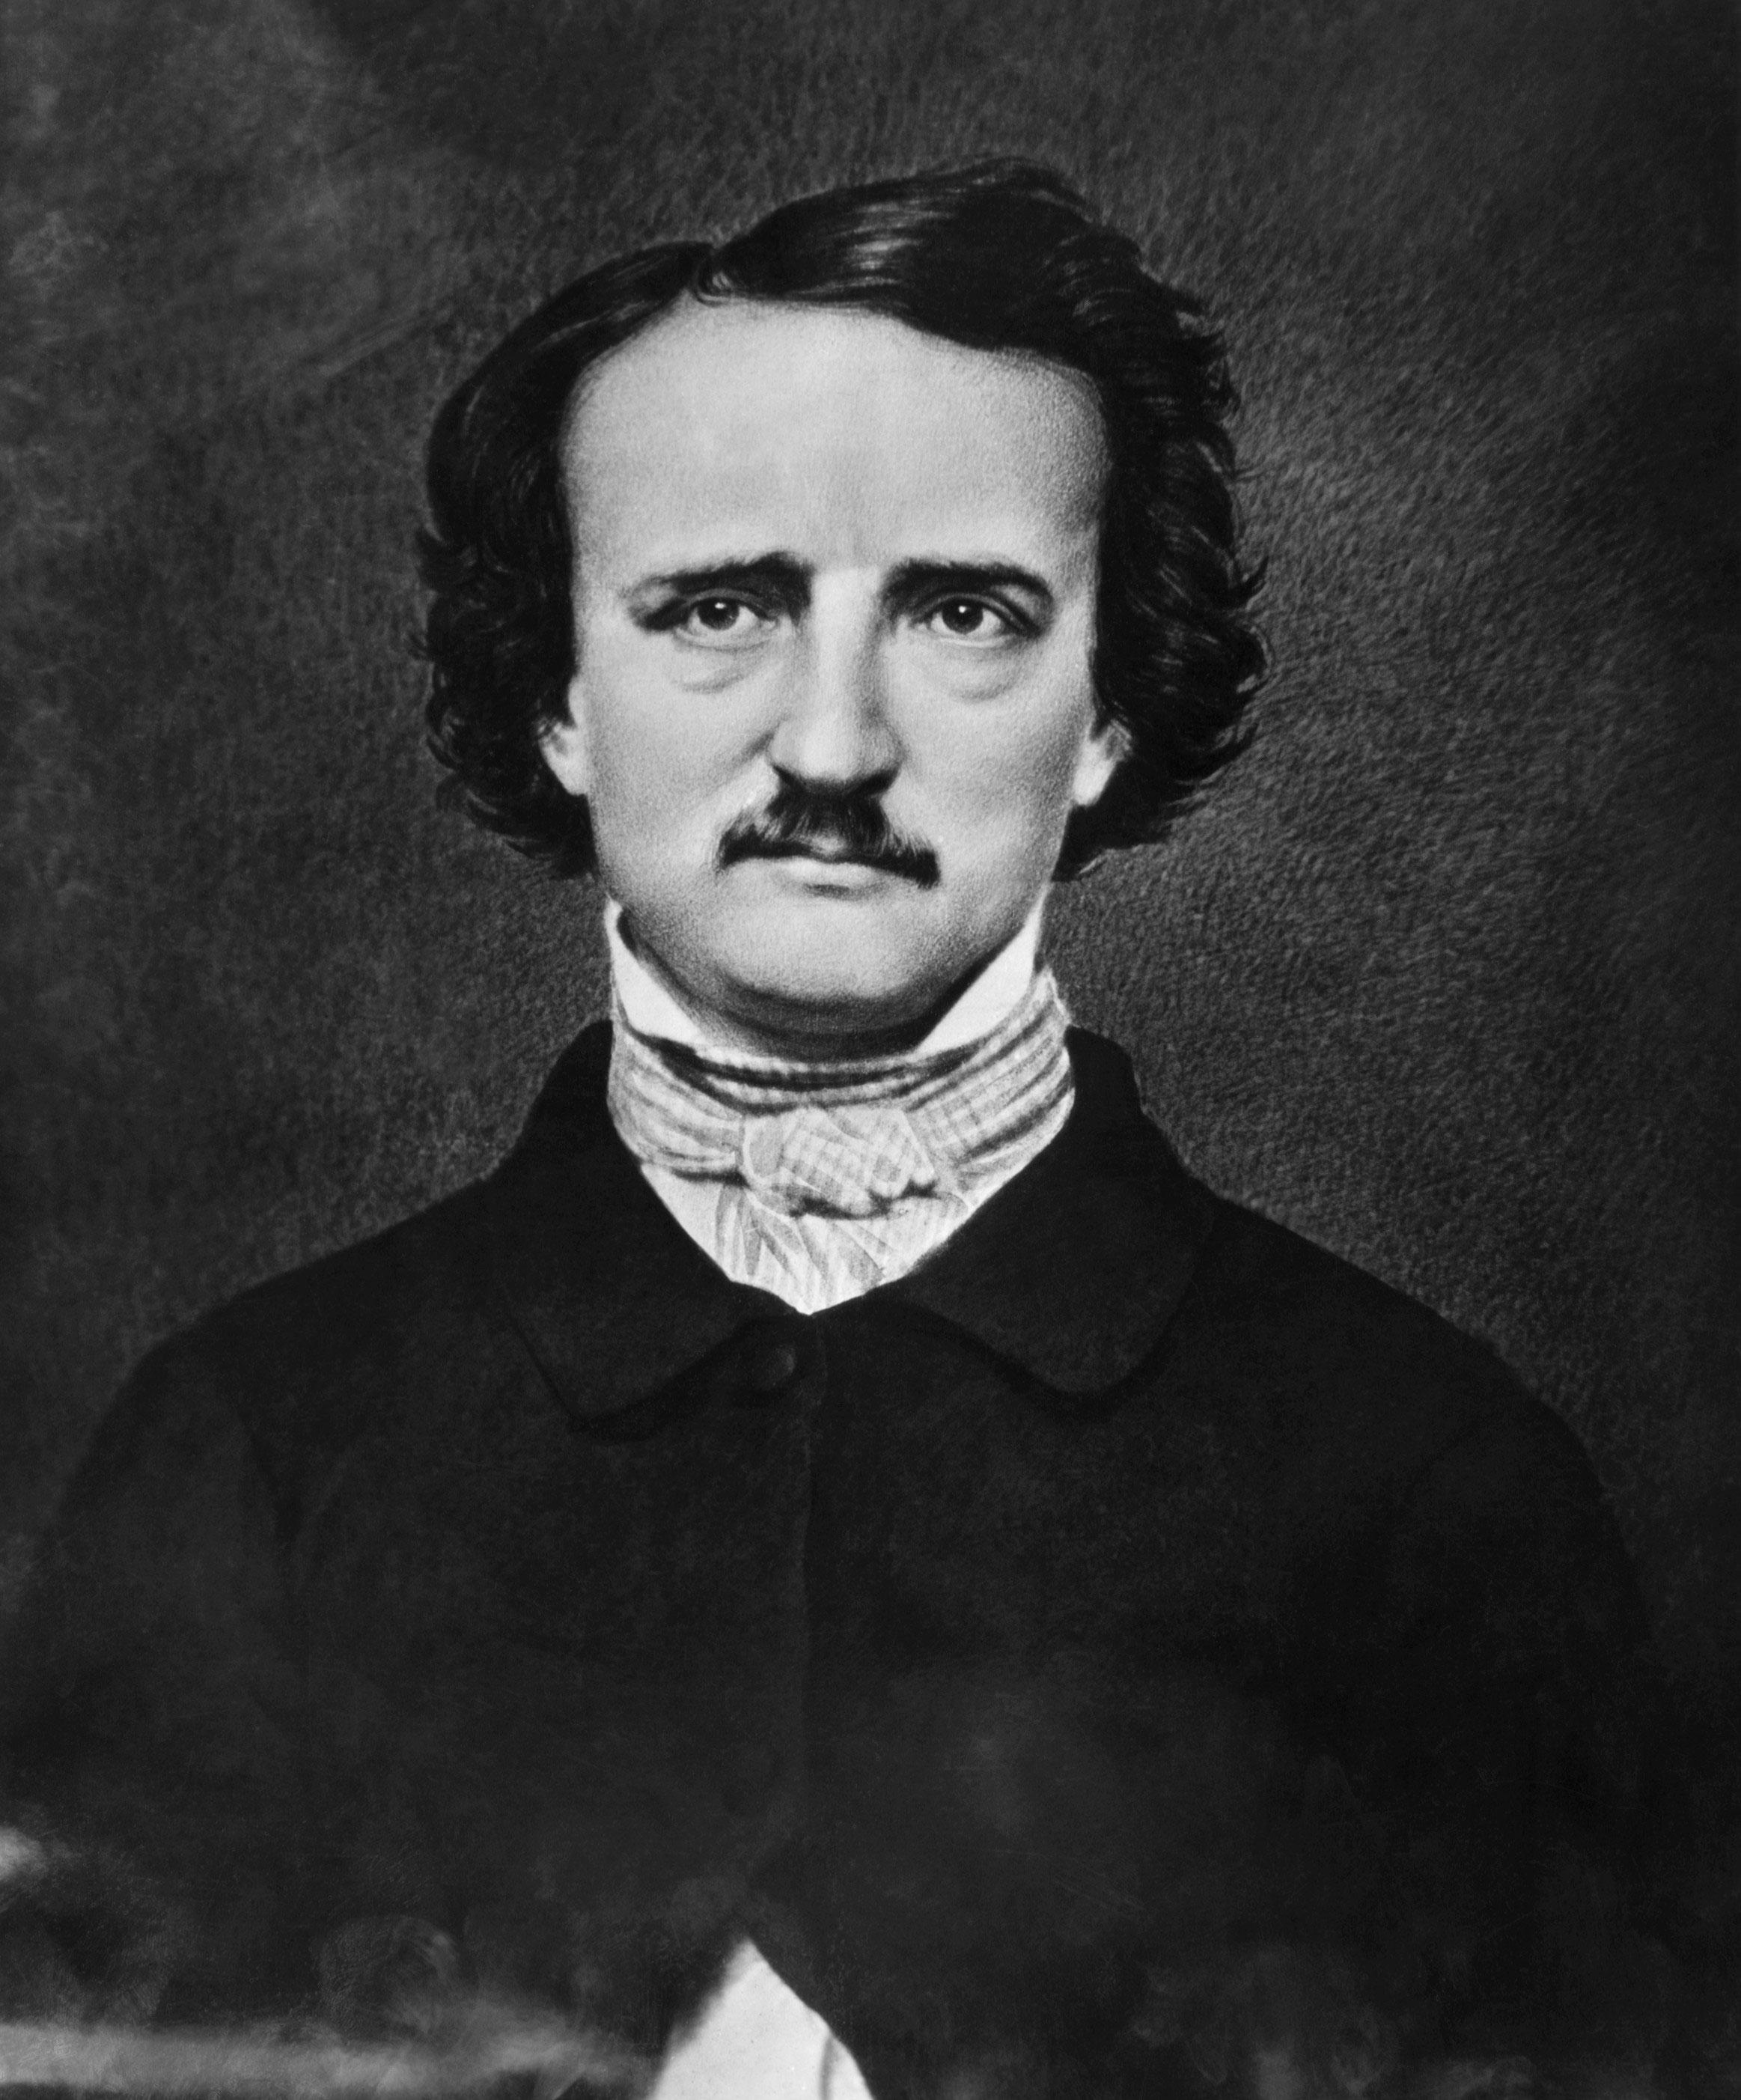 Edgar Allan Poe photo #8445, Edgar Allan Poe image